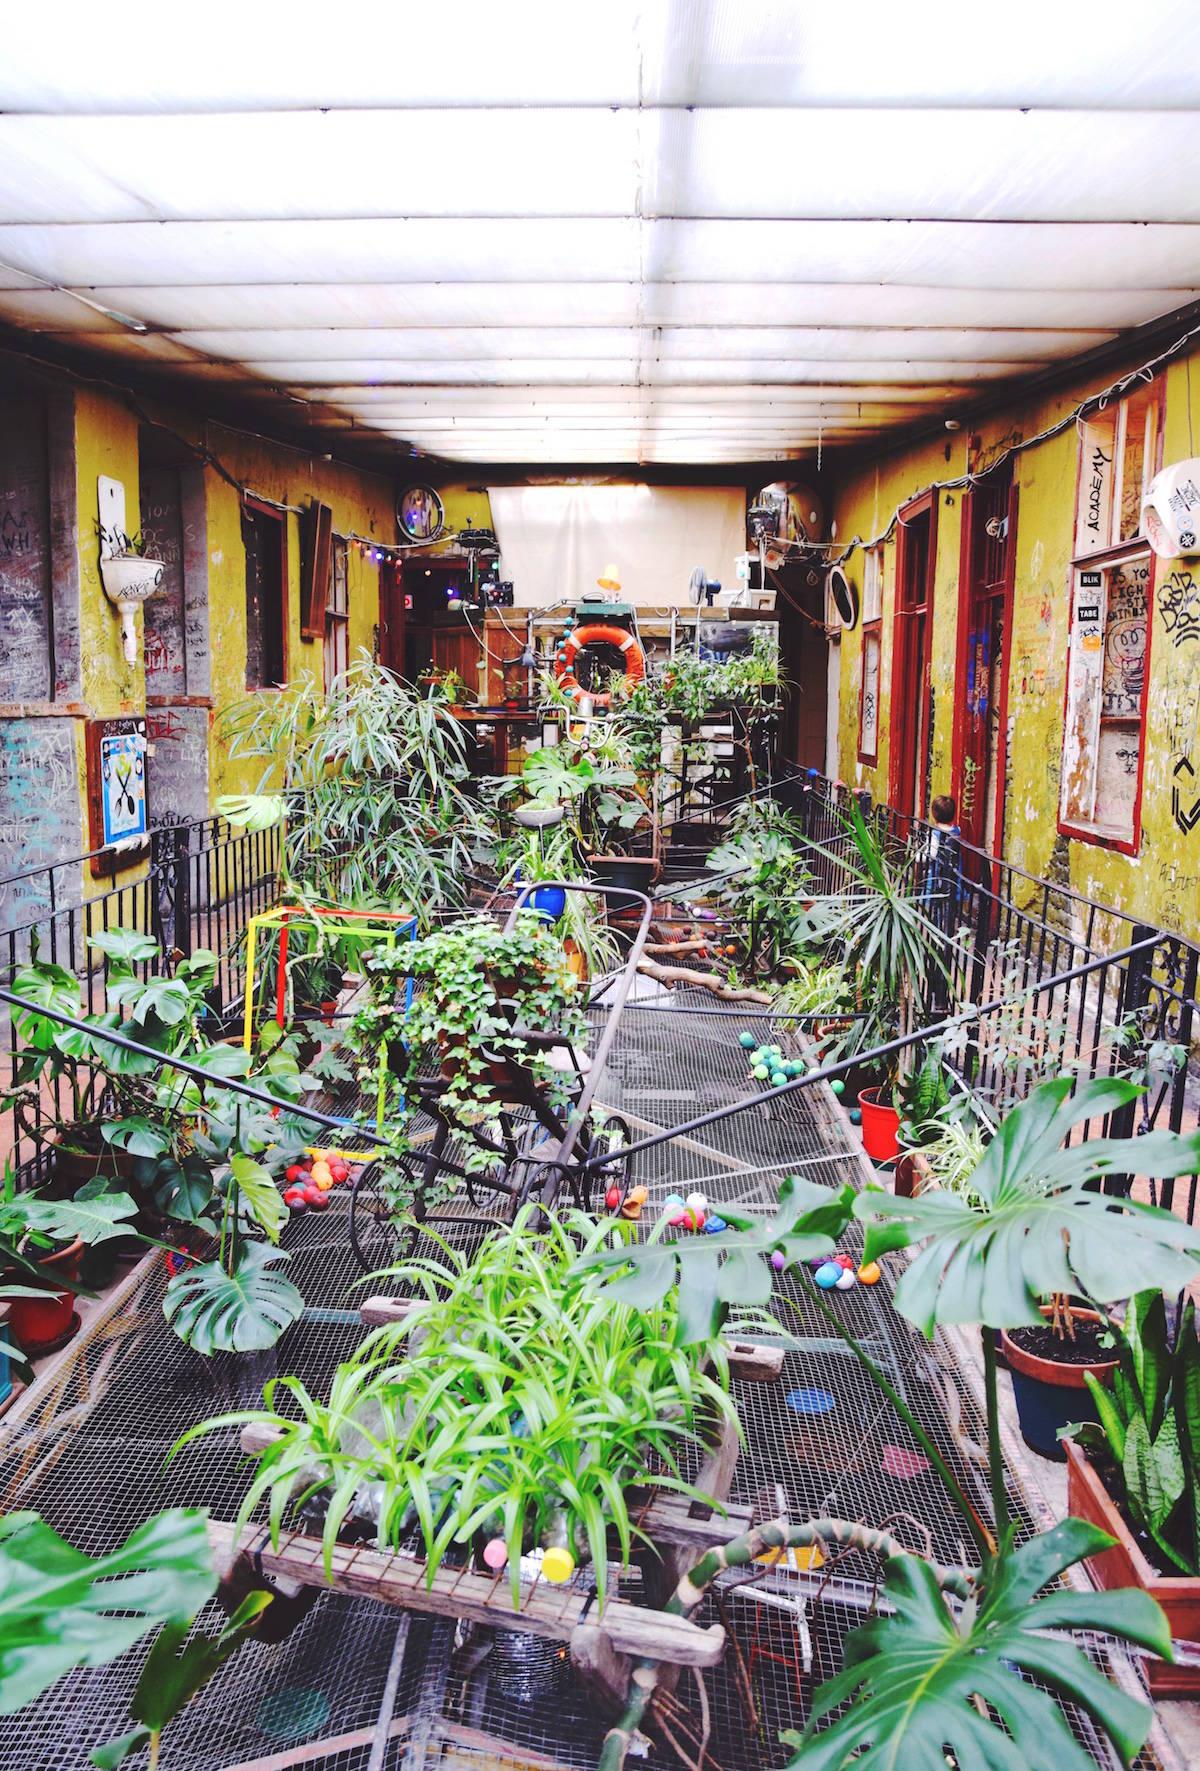 szimpla kert ruin pub budapest